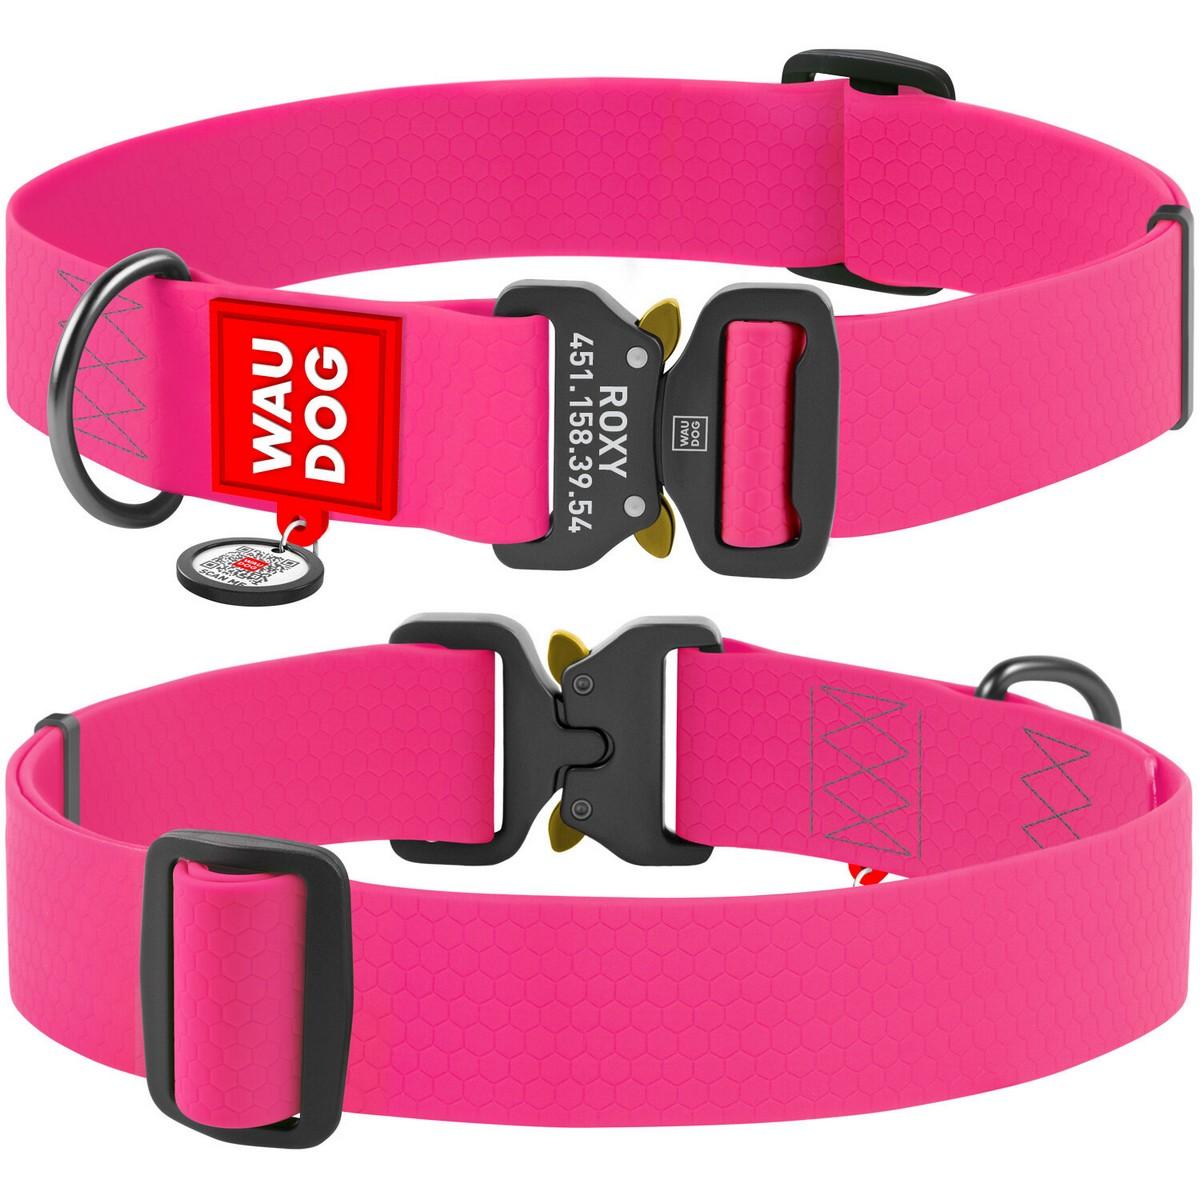 Нашийник для собак водостійкий WAUDOG Waterproof c QR паспортом, металева пряжка-фастекс, рожевий XXL (ширина 40 мм, довжина 43-70см)